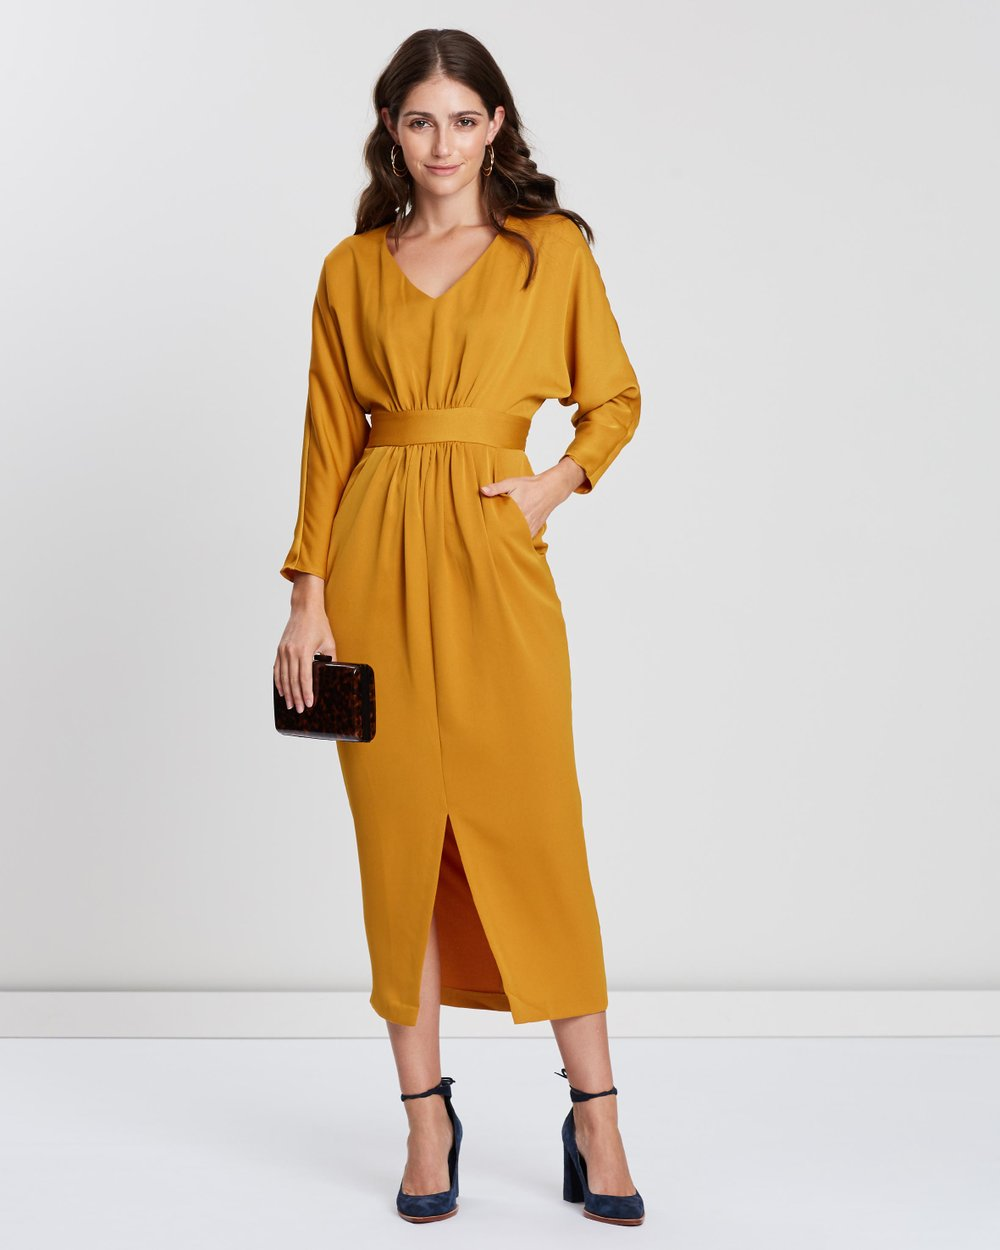 f905dd1b79a Gathered Waist Tulip Dress by Closet London Online